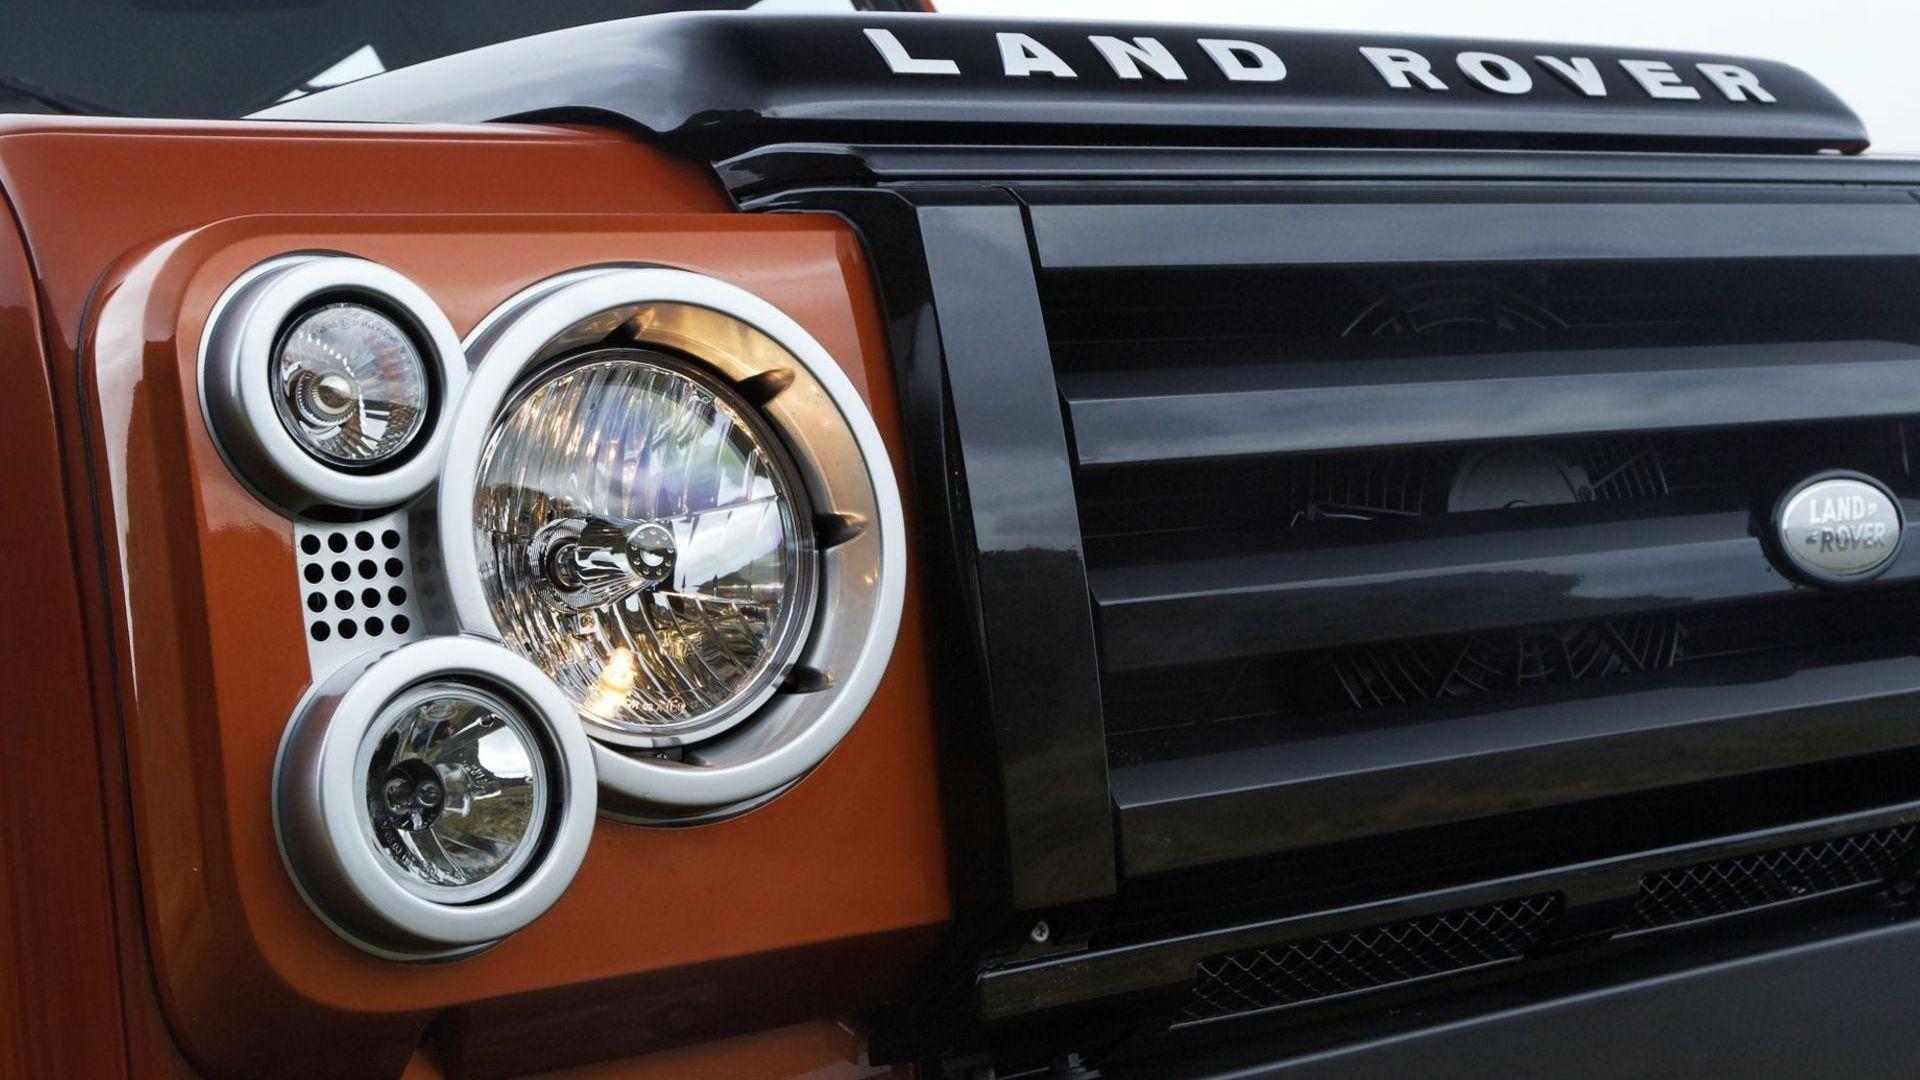 Land Rover Range Rover Wallpapers 1920x1080 Full Hd 1080p Desktop